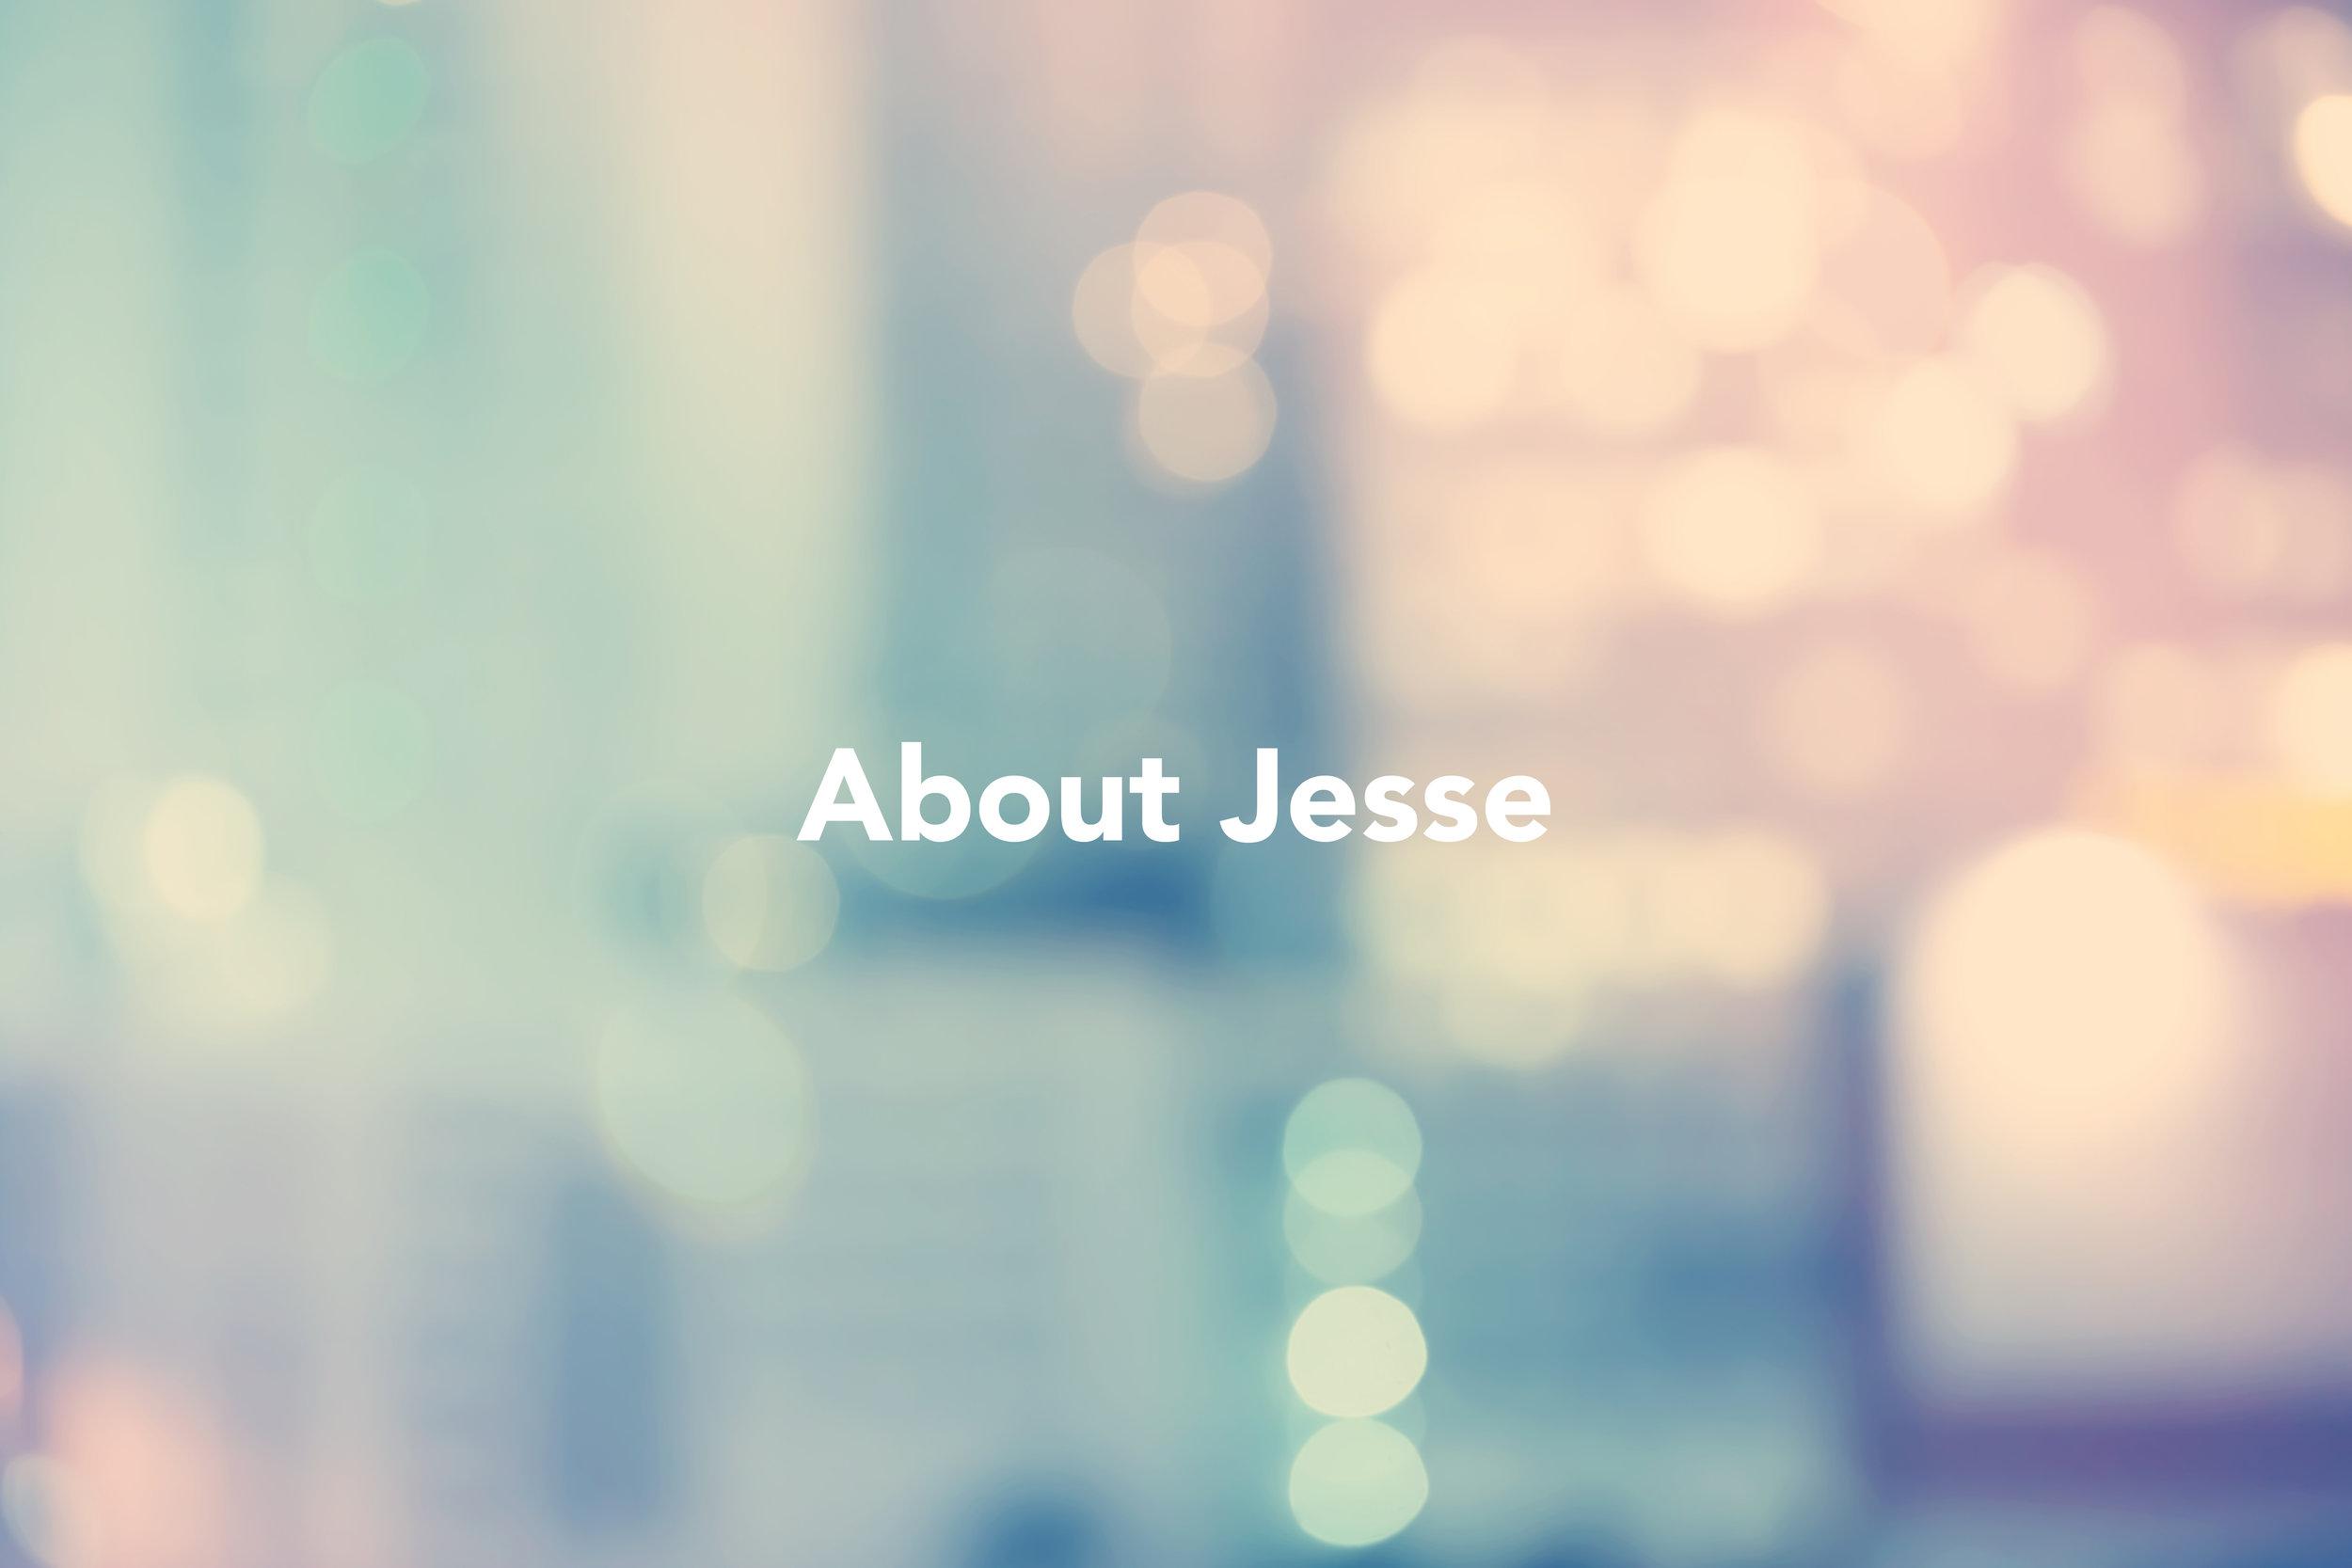 About Jesse